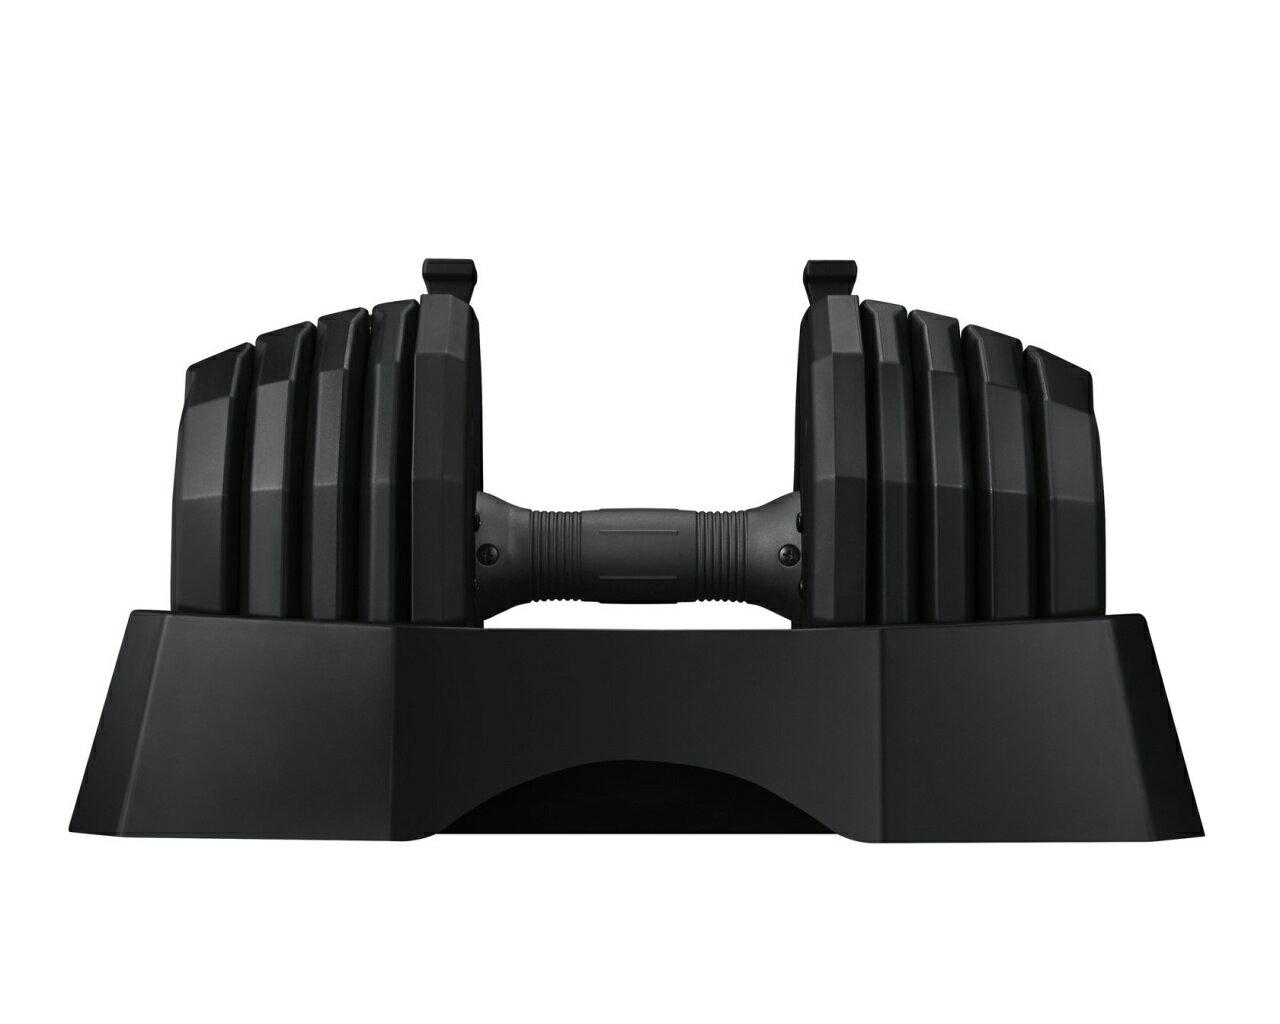 【Byzoom Fitness】 調整式啞鈴 (50LB/支) 五段重量秒速調整/長度隨重量改變 - 50磅單支